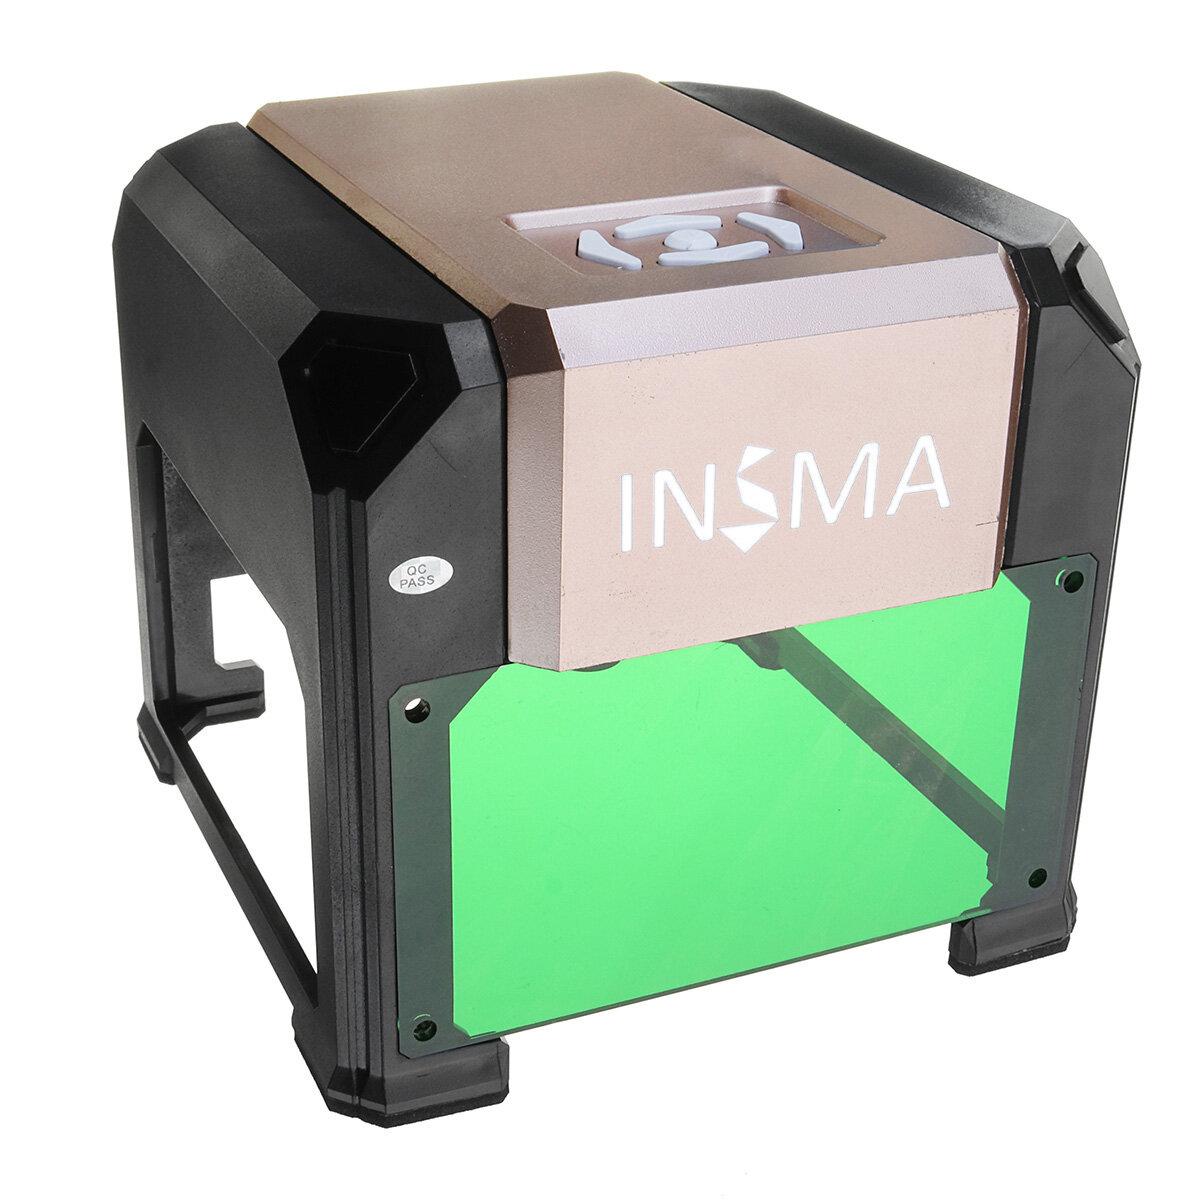 3000mW USB Laser Engraver Desktop DIY Logo Mark Printer Carver Laser Engraving Machine